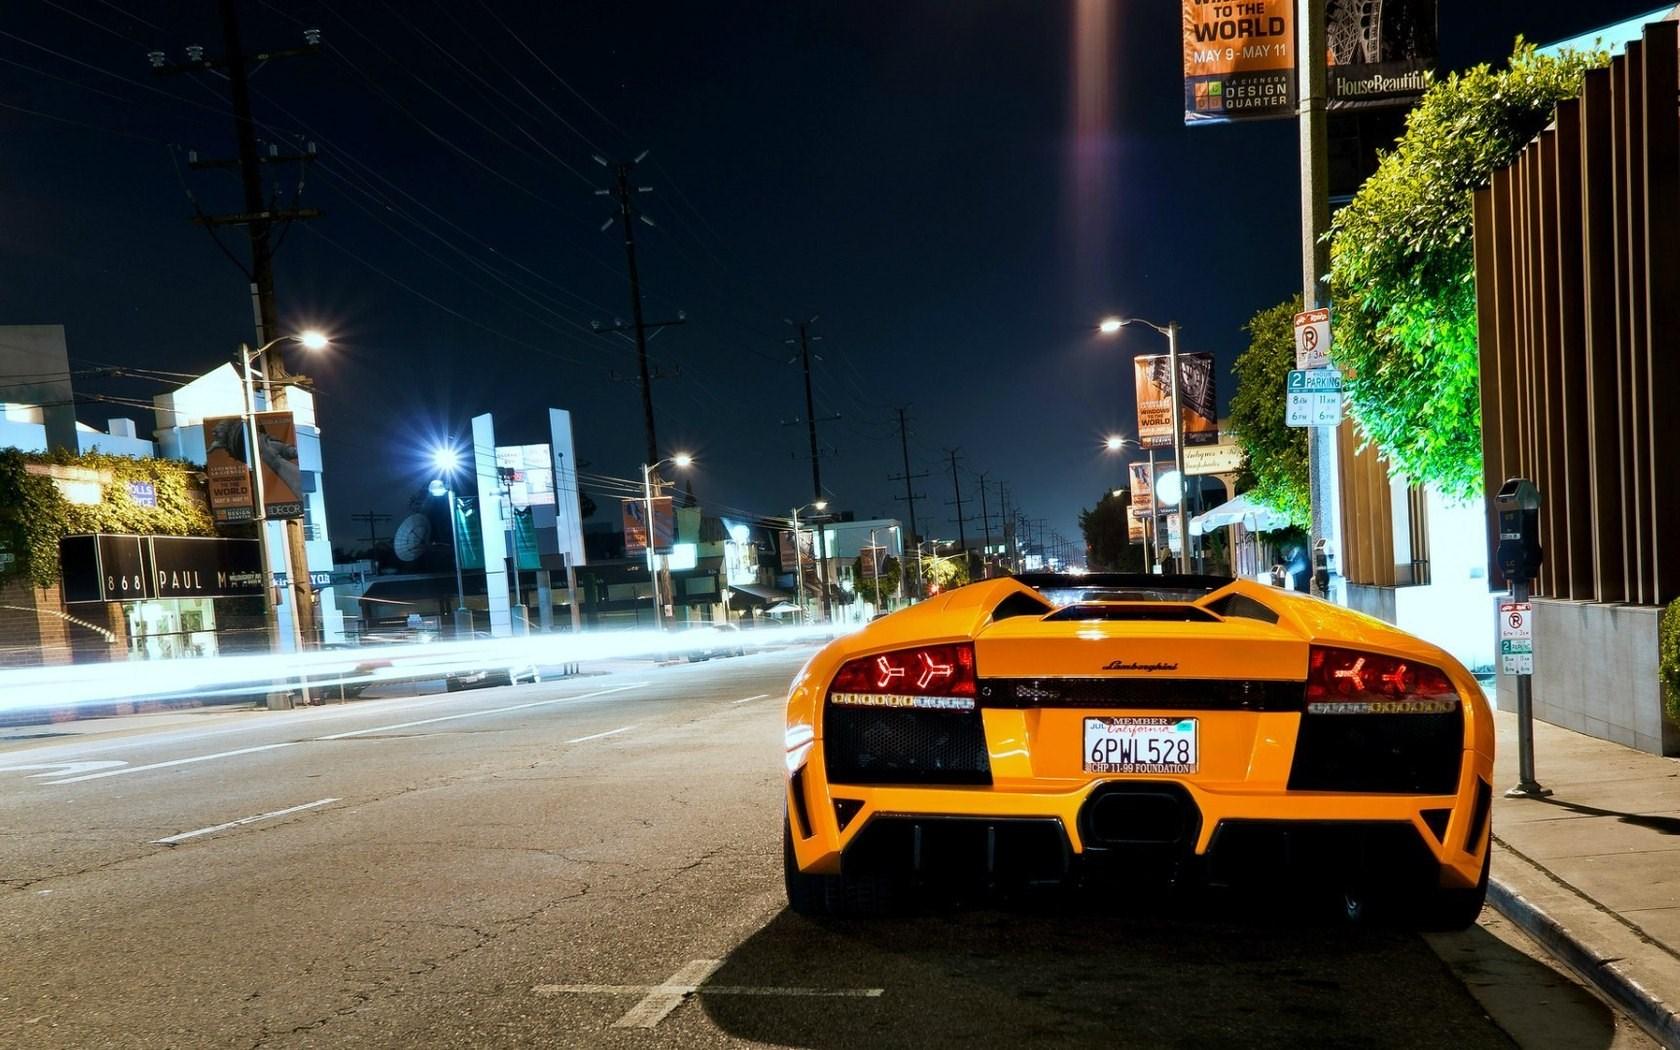 murcielago roadster street night city photo wallpaper 1680x1050 1680x1050